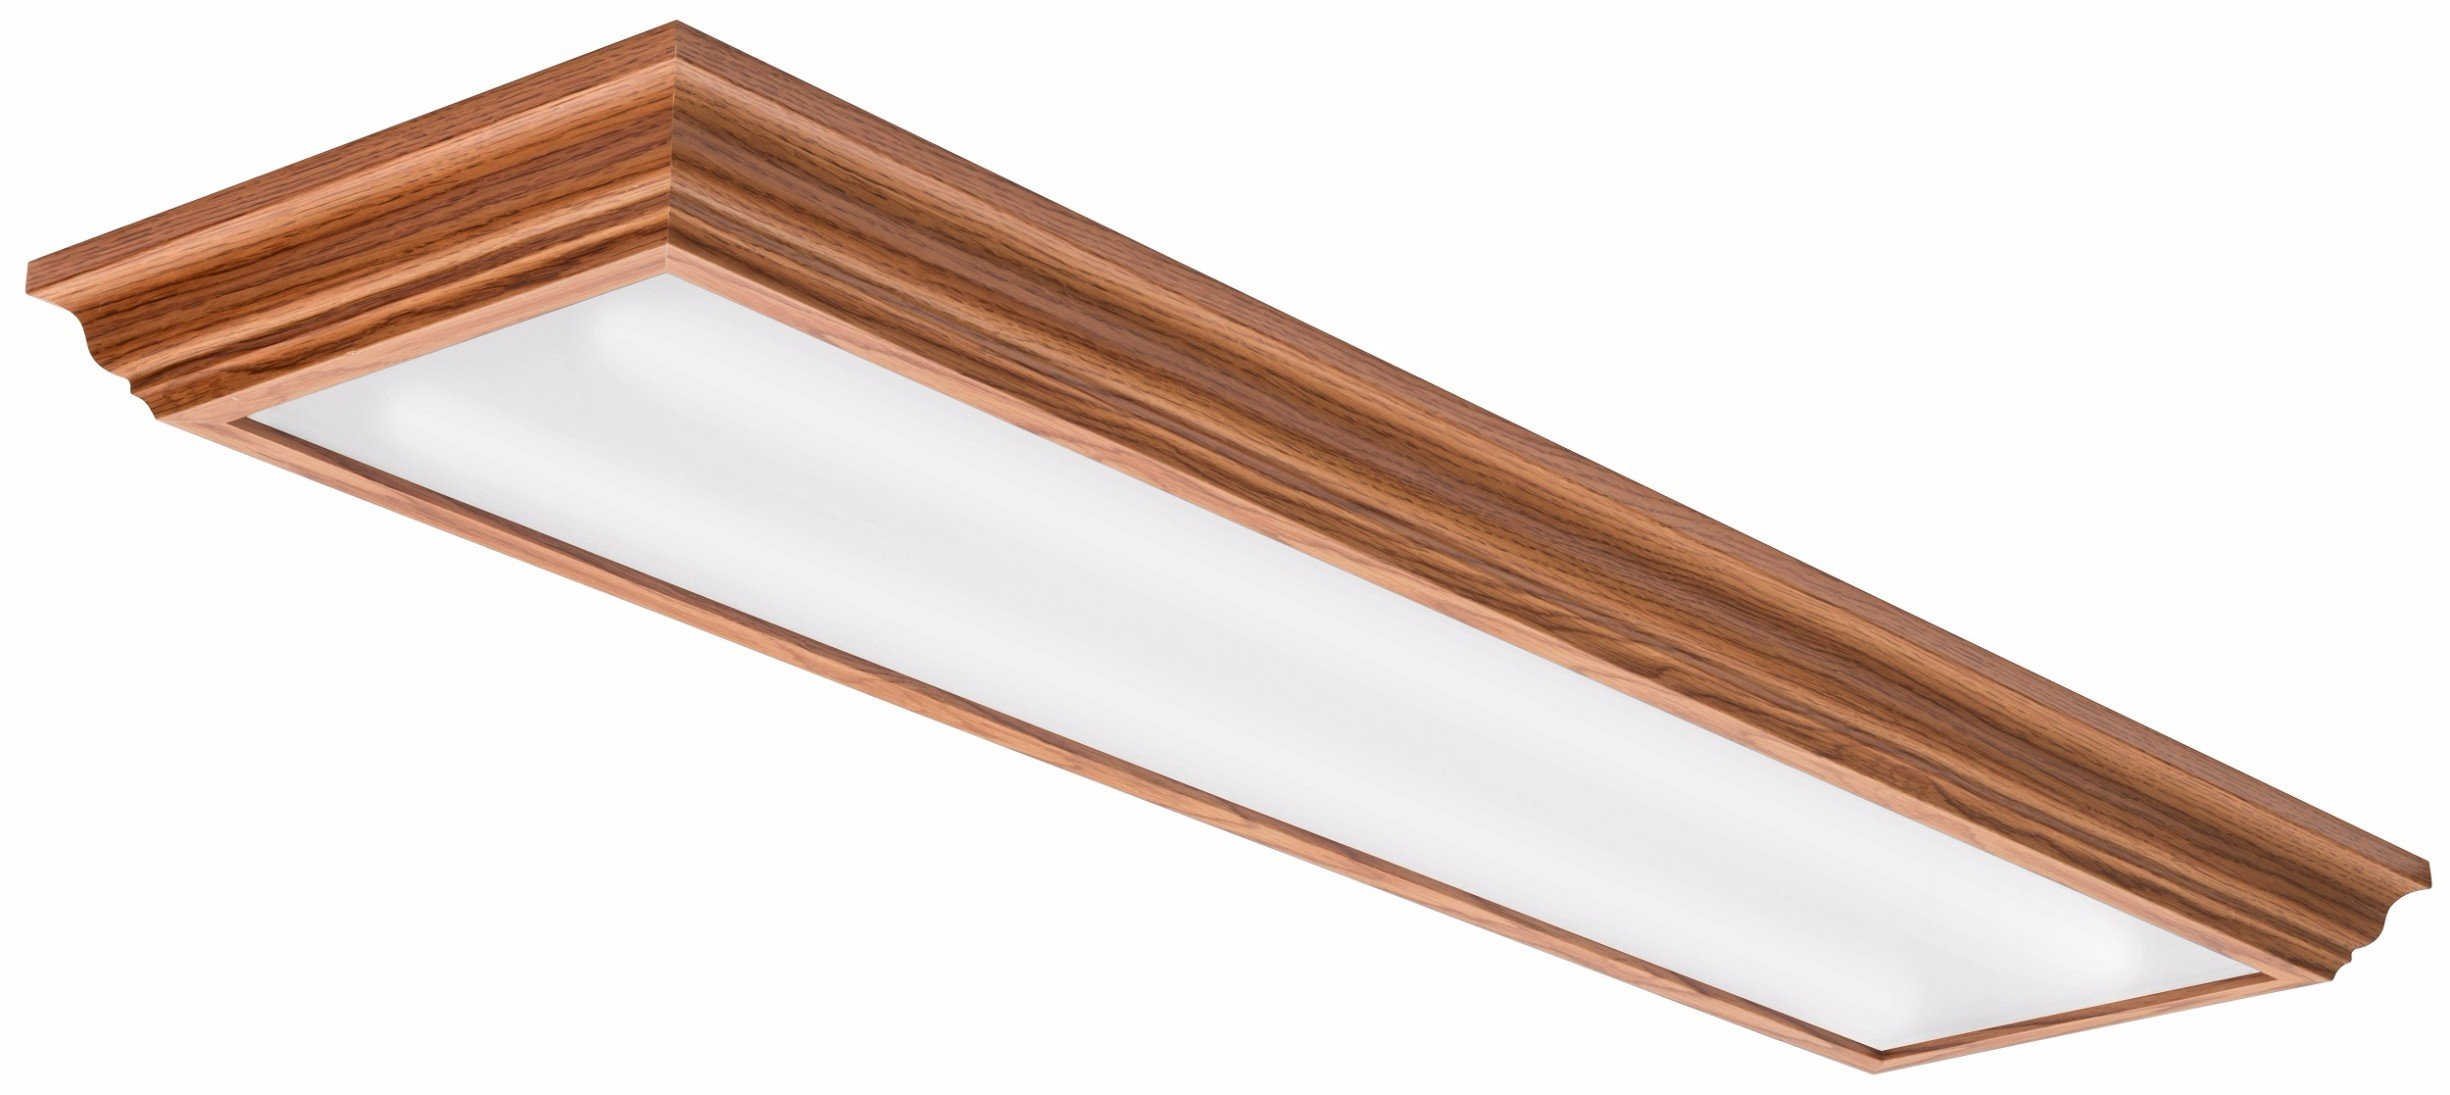 Lithonia Lighting Oak 4-Ft LED Flush Mount, 4000K, 35.5W, 2,800 Lumens by Lithonia Lighting